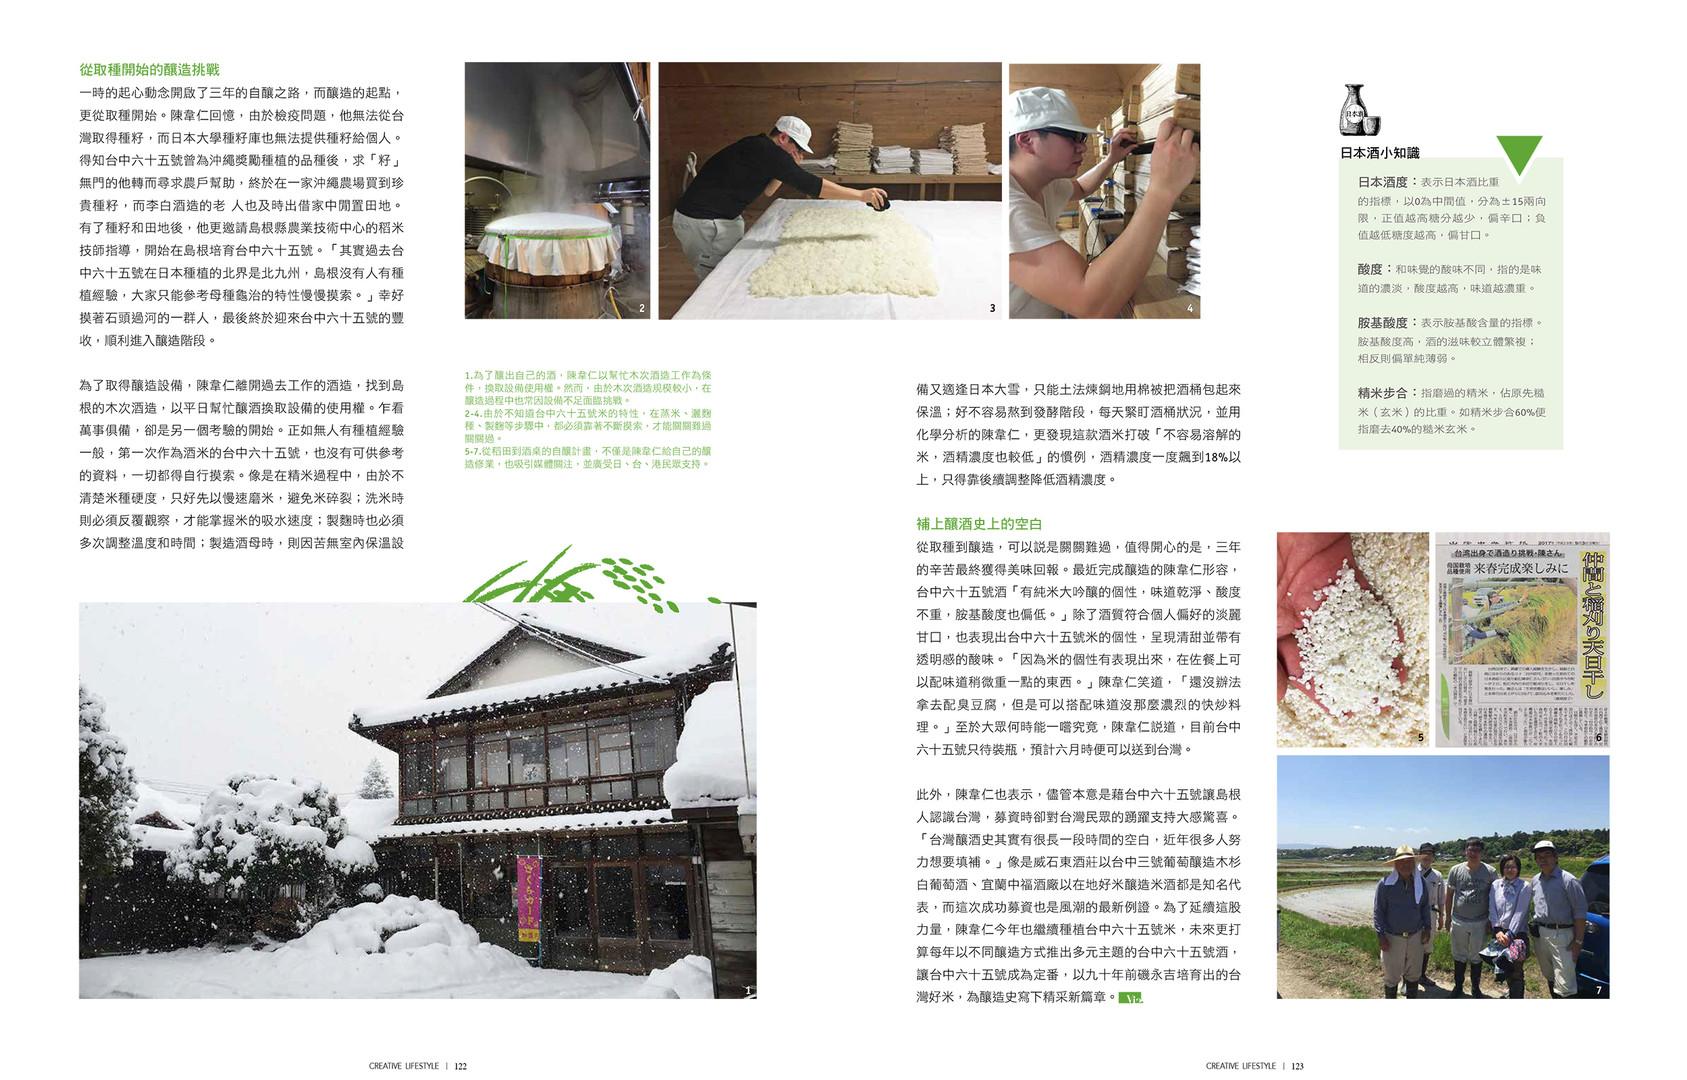 Creative-Lifestyle169-從稻田到酒桌的台米新味 -2.jpg